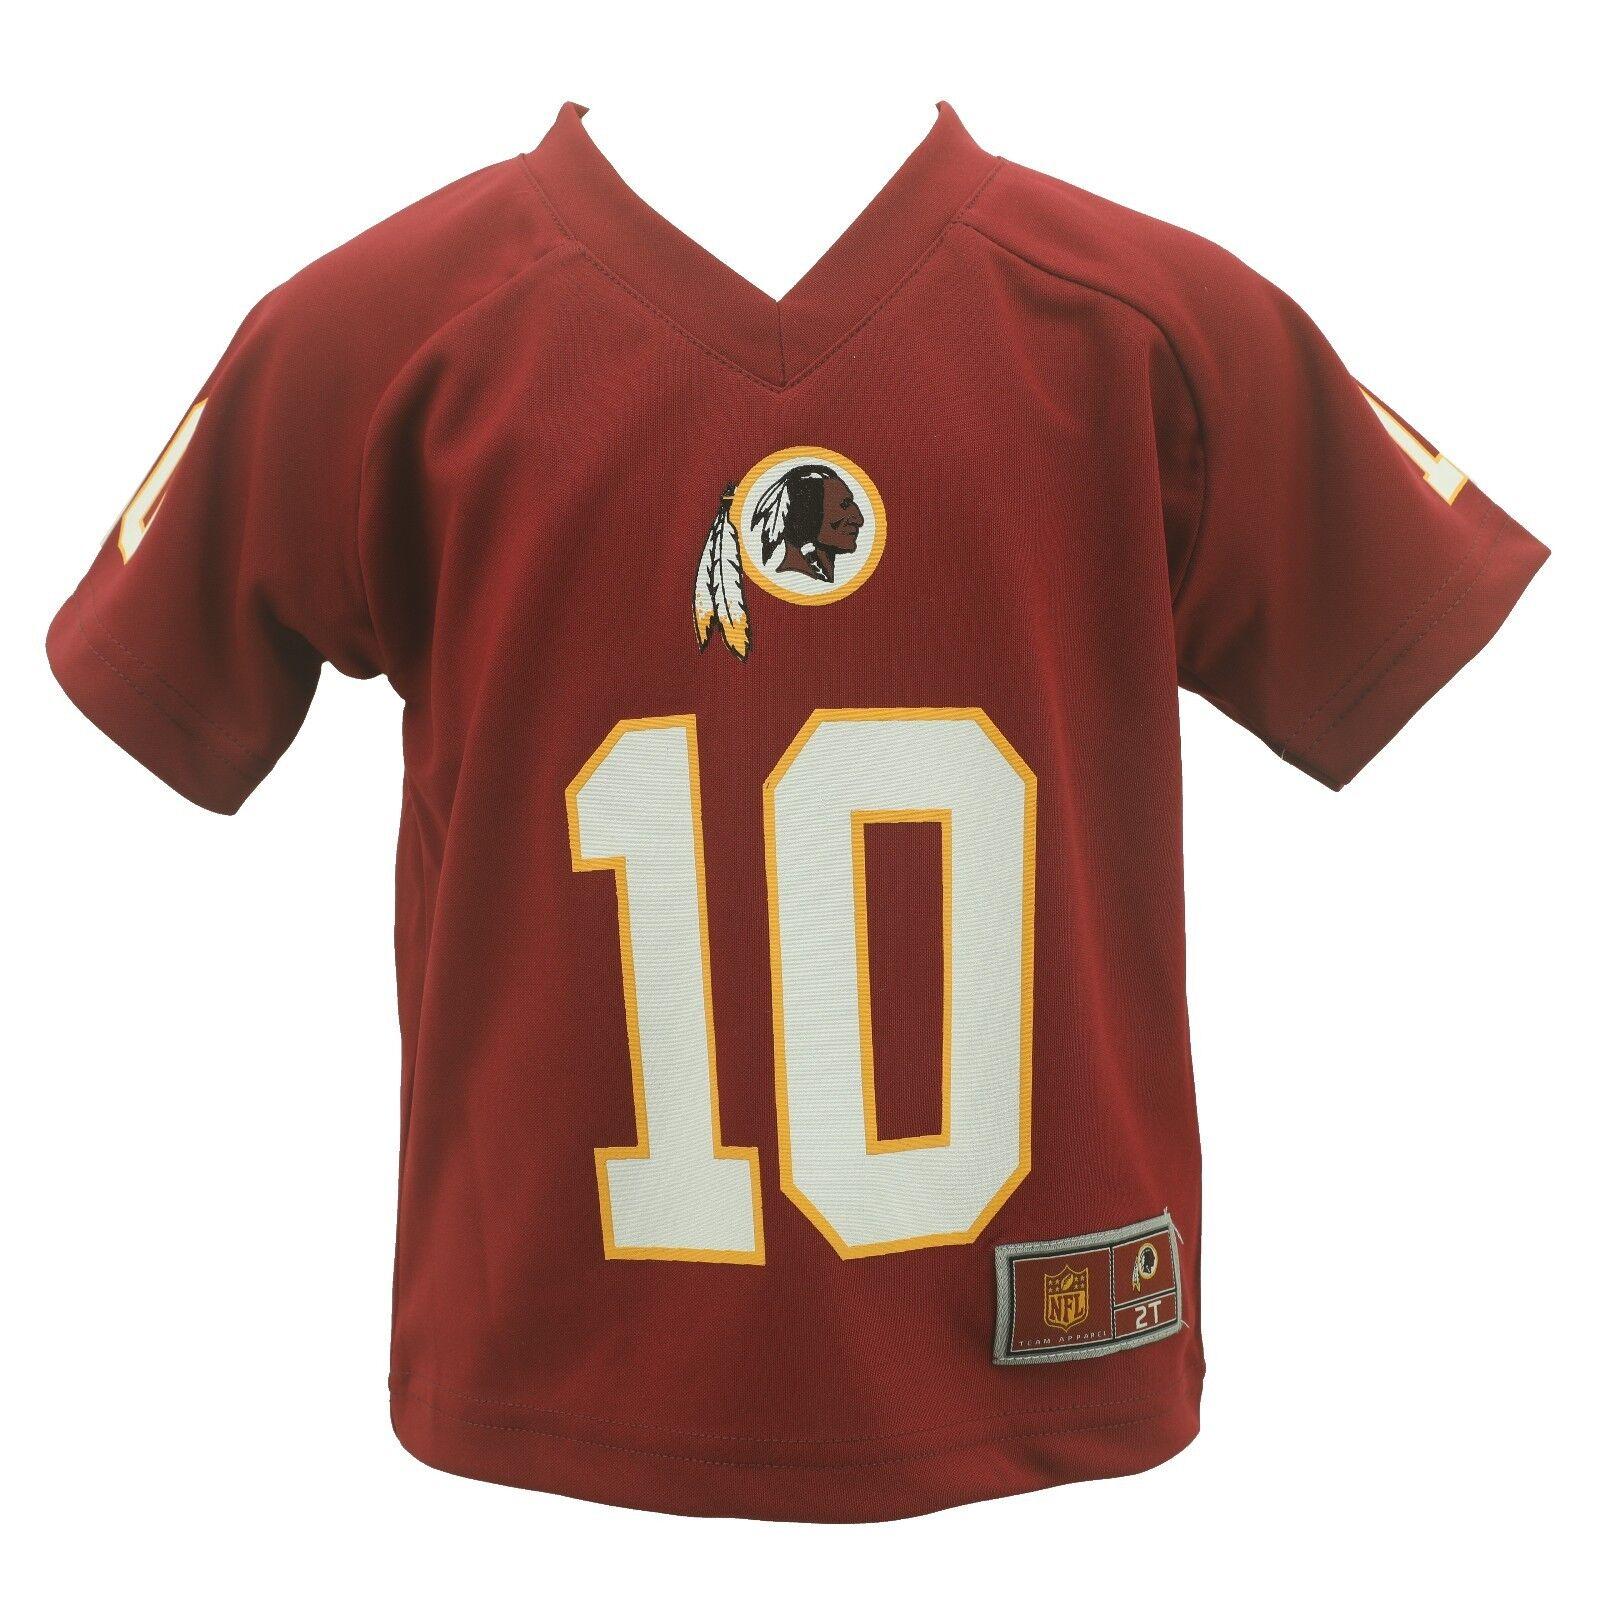 buy popular 0eb7e 42ec4 Details about Washington Redskins Kids Infant Toddler Size Griffin RG3  Official NFL Jersey New